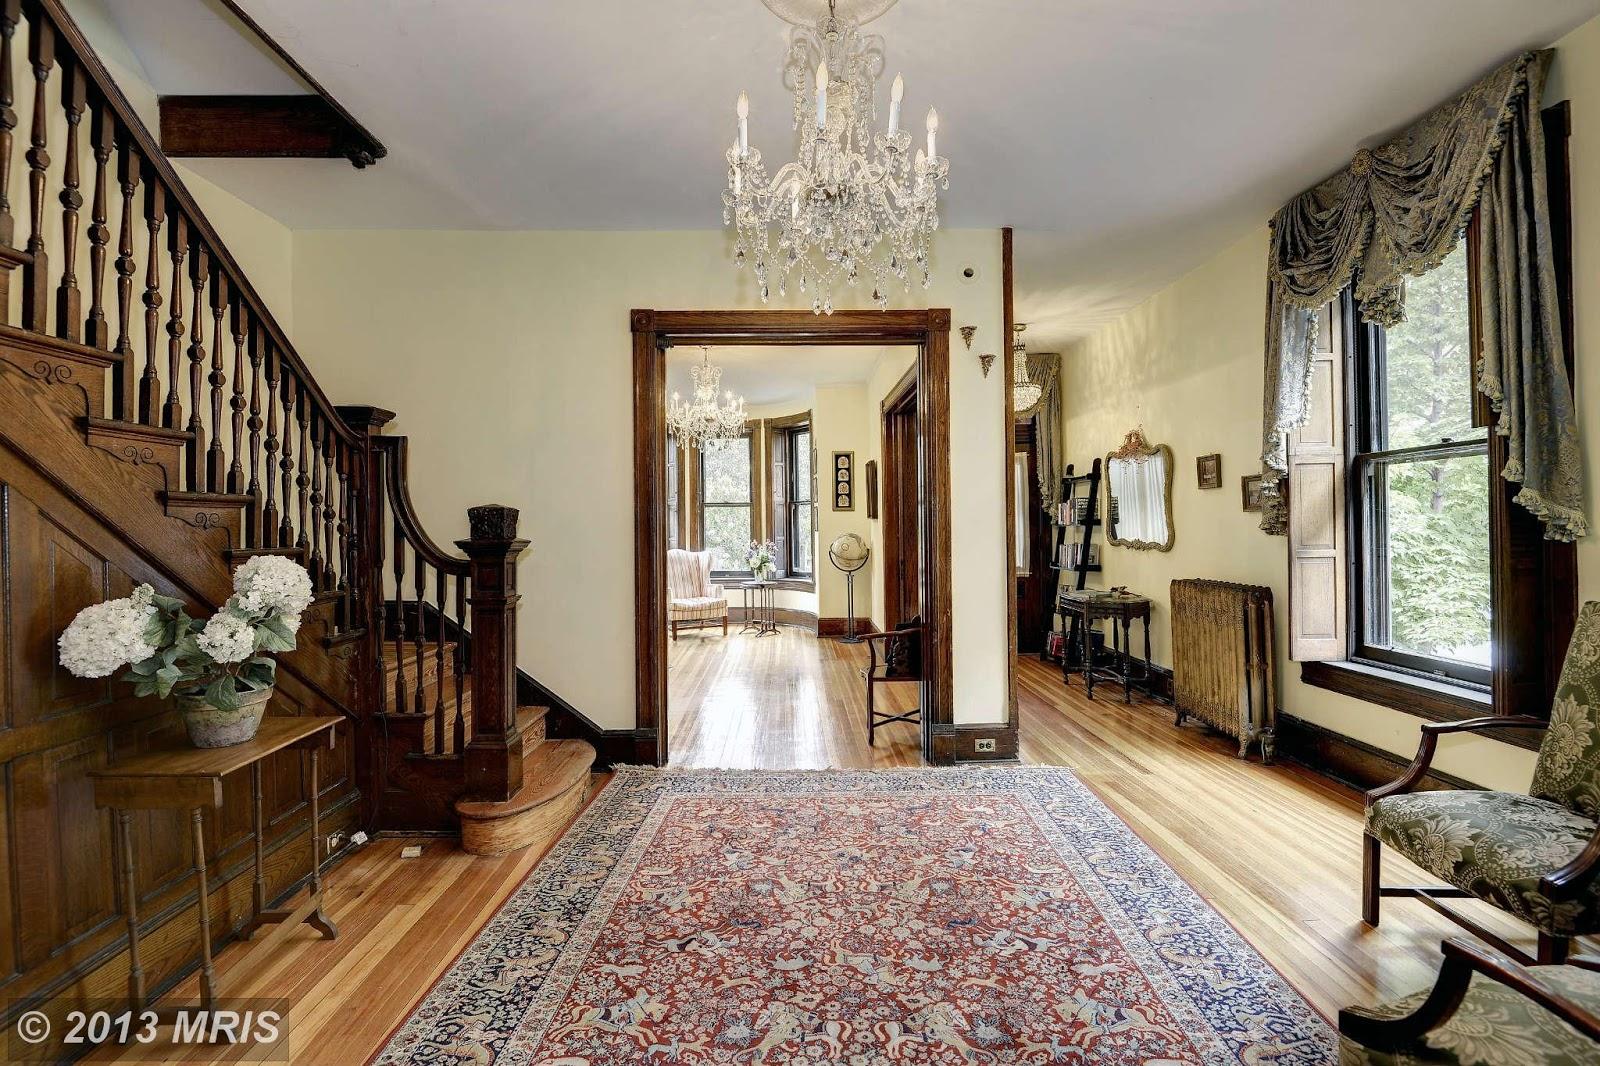 Old World, Gothic, and Victorian Interior Design: August 2013